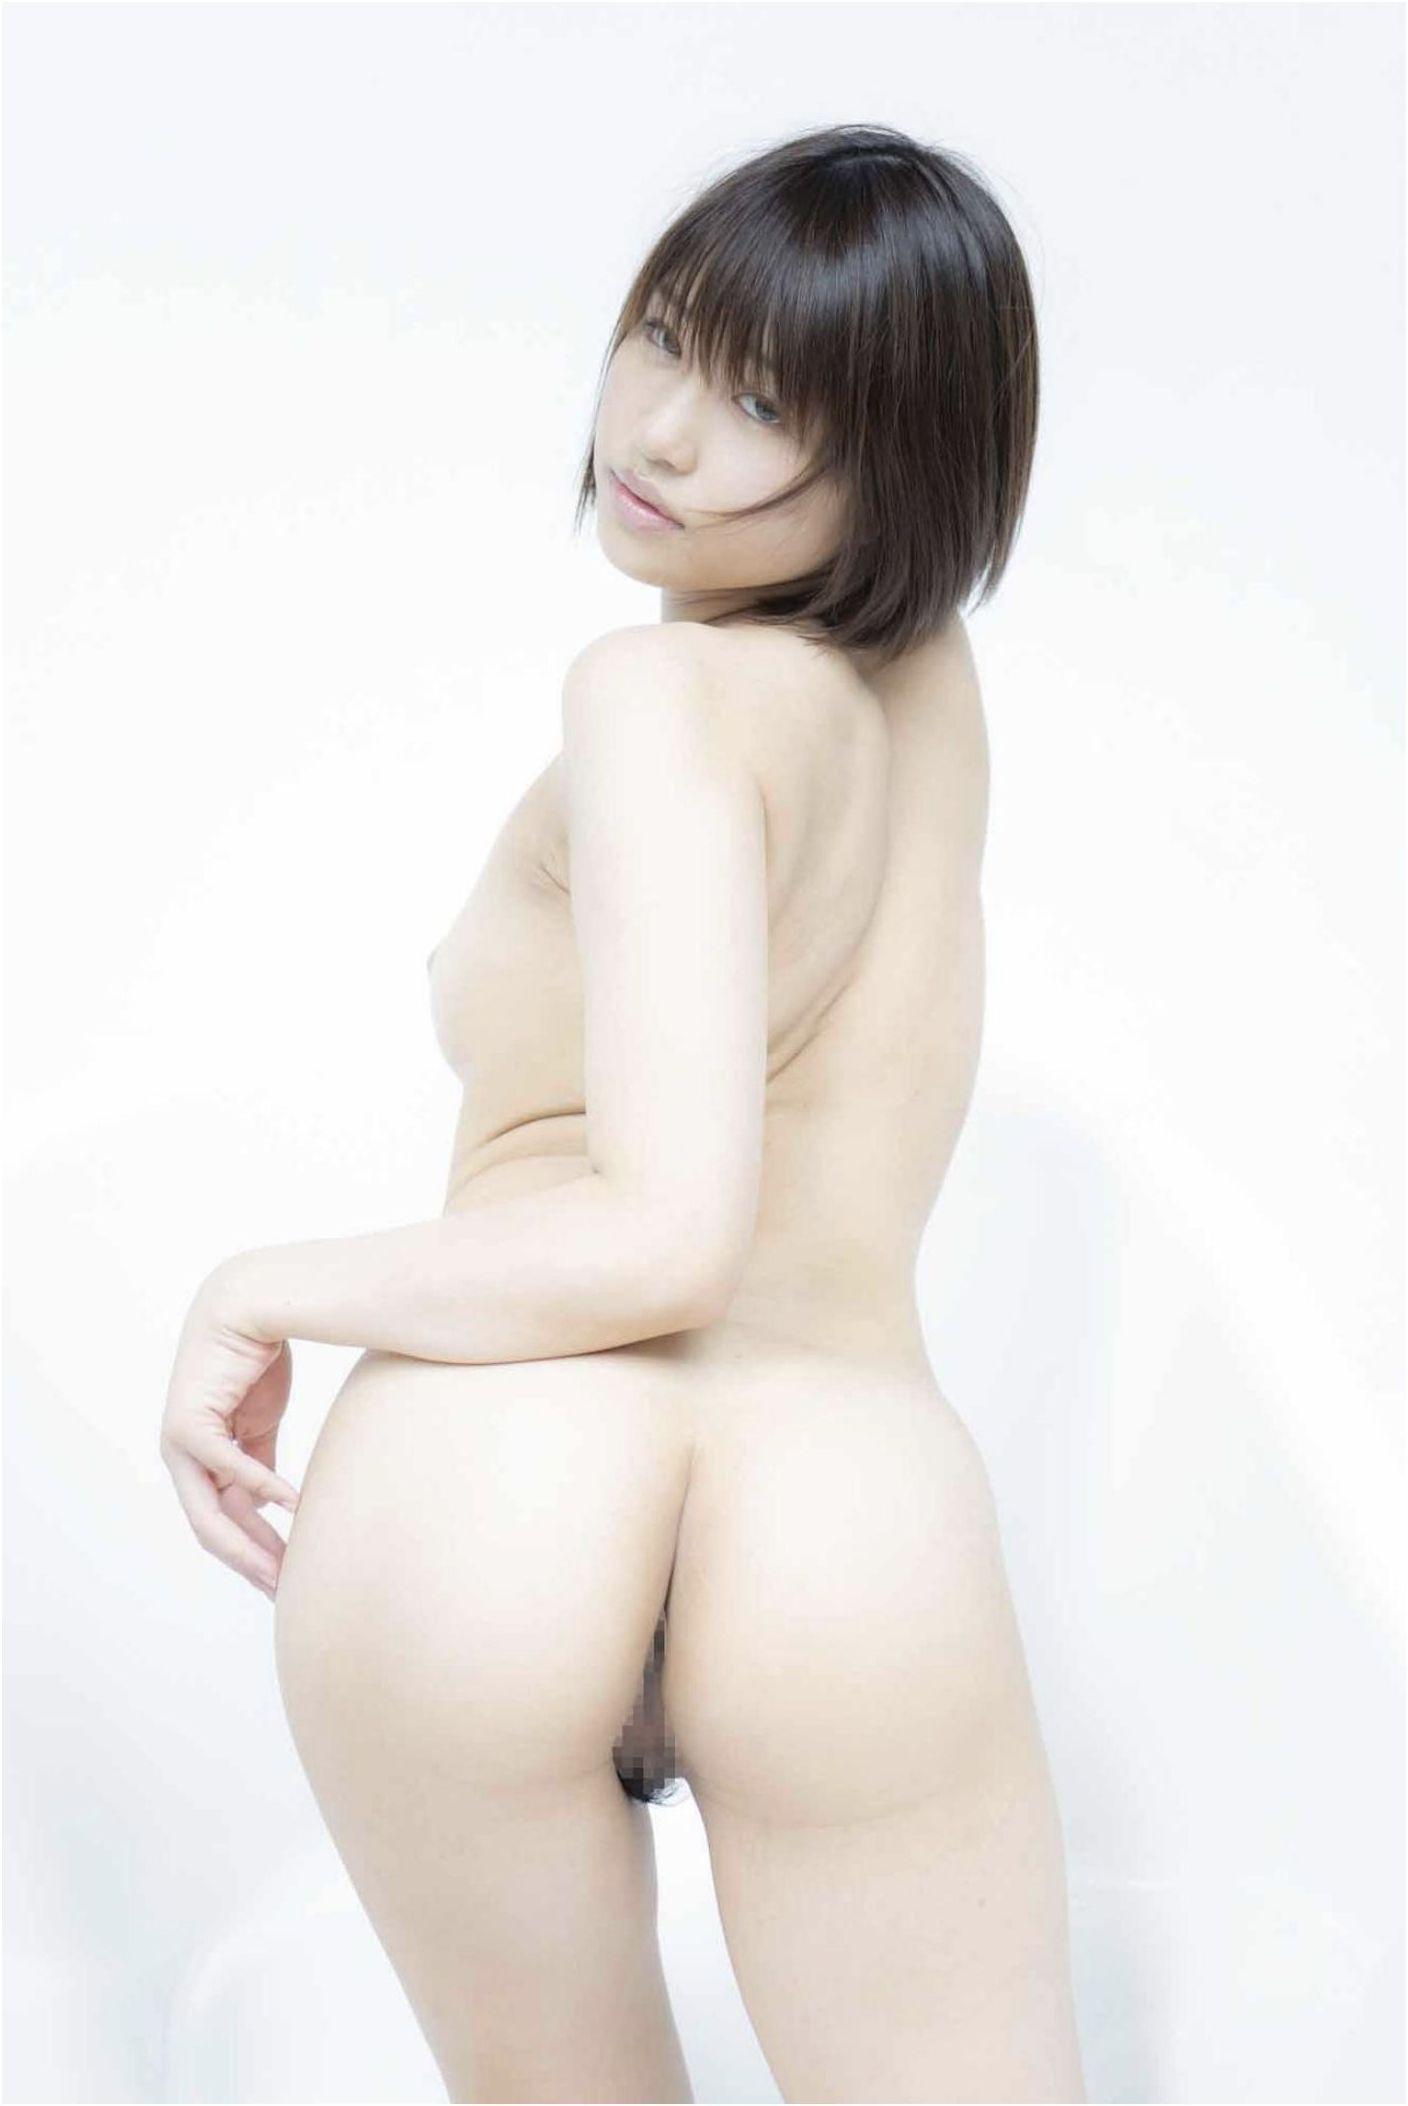 SOFT ON DEMAND GRAVURE COLLECTION 唯井まひろ01 photo 095